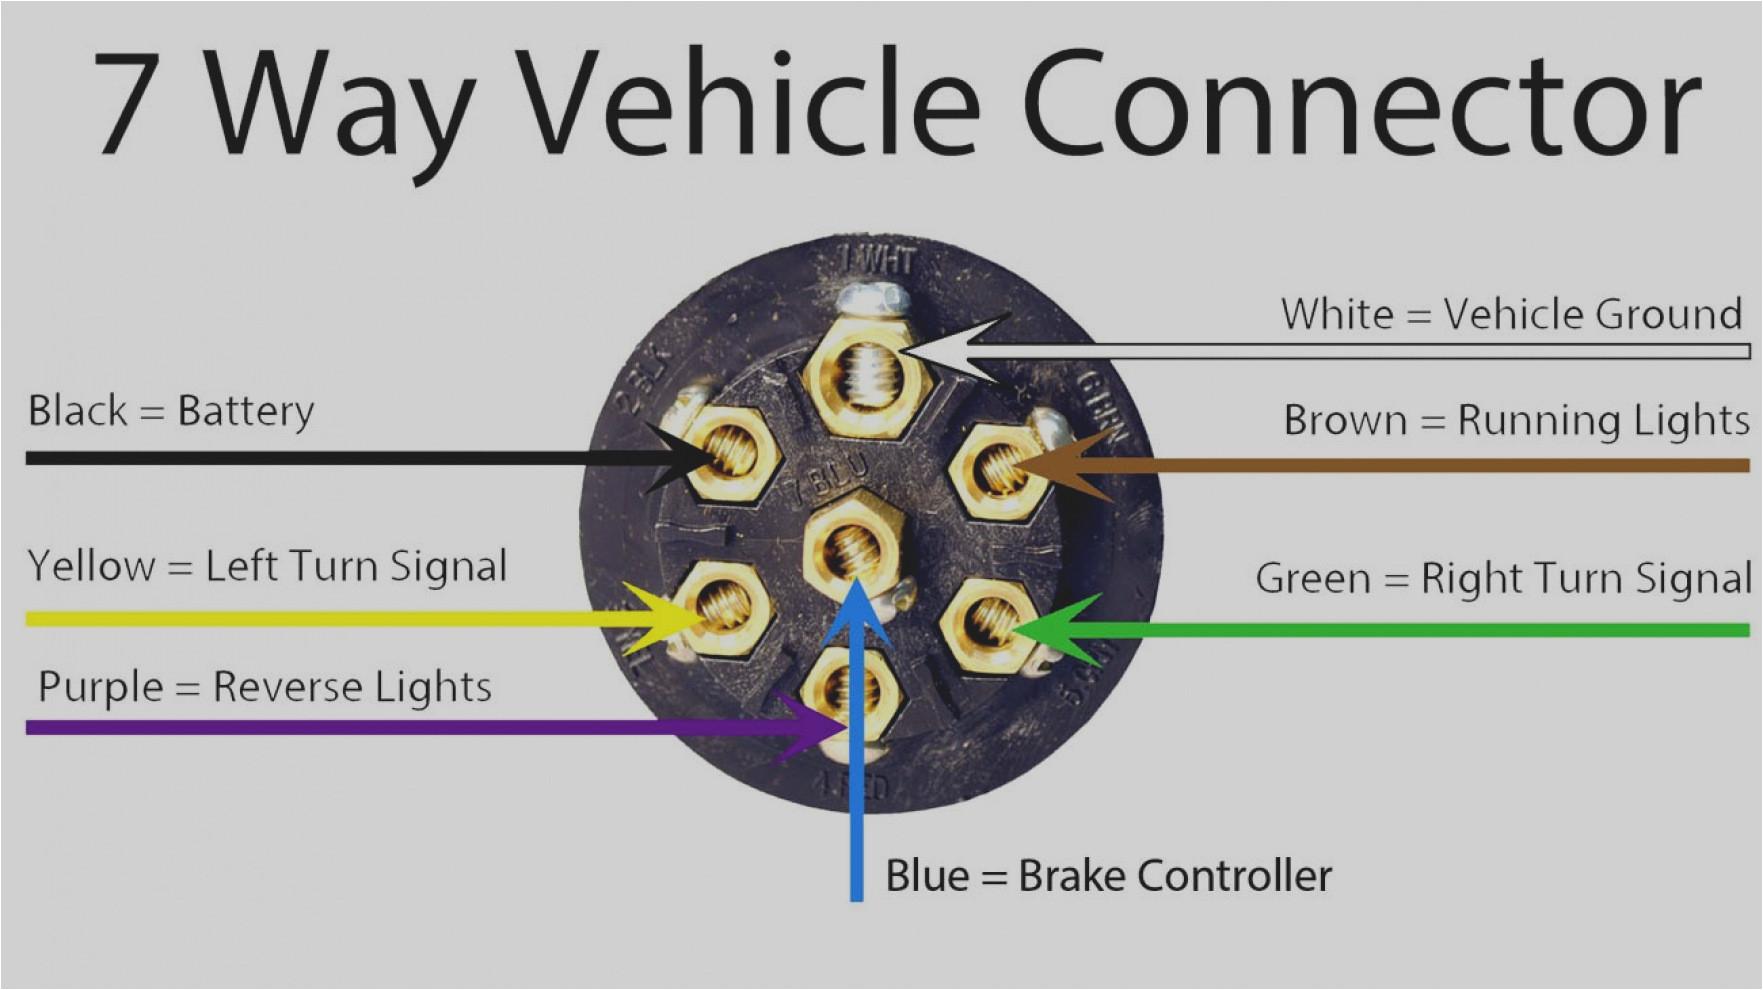 6 pin to 7 pin trailer wiring harness wiring diagram article review 6 pin round trailer wiring diagram free download